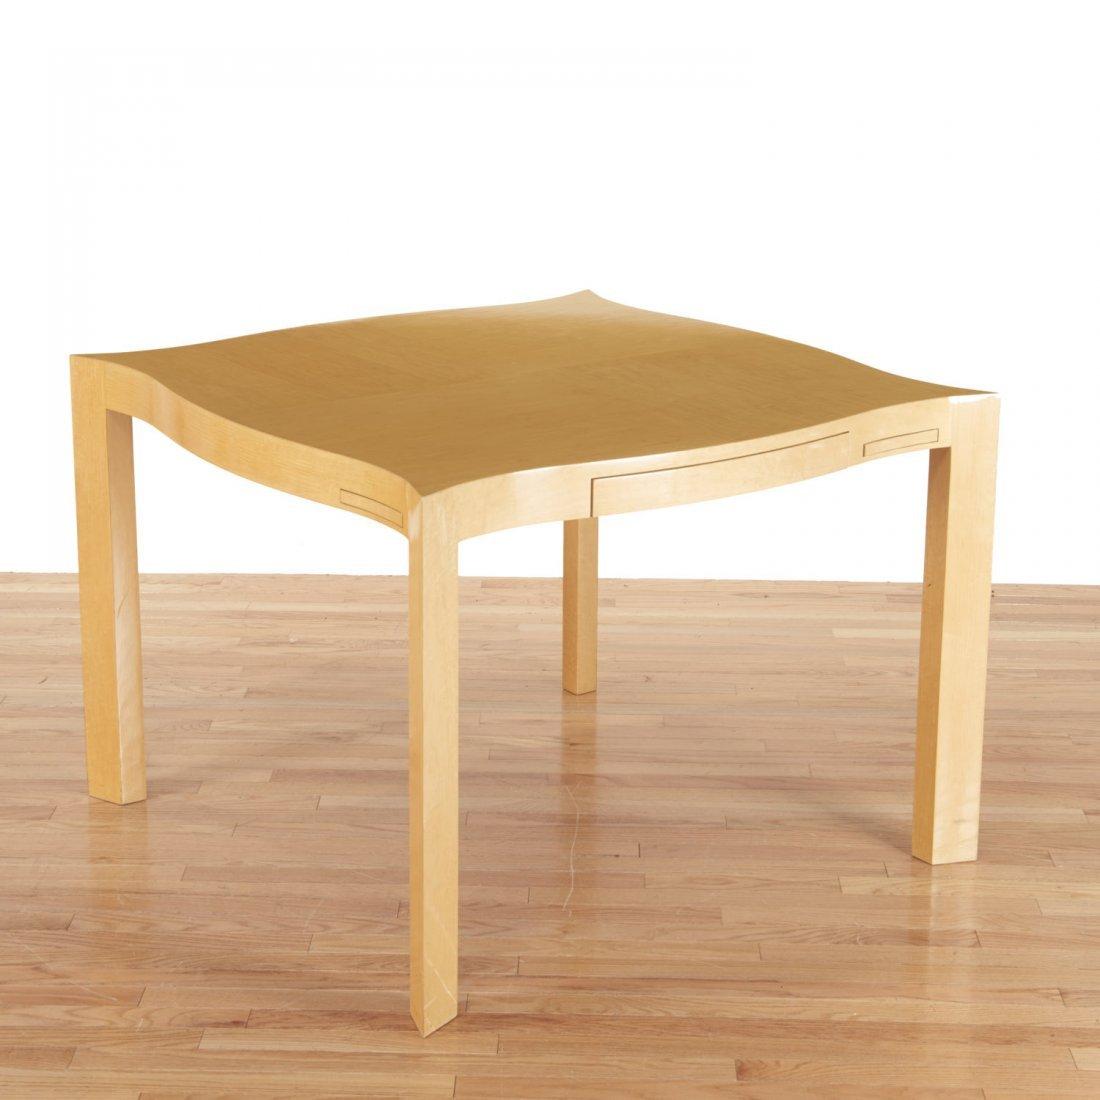 Designer shaped blonde wood bridge table